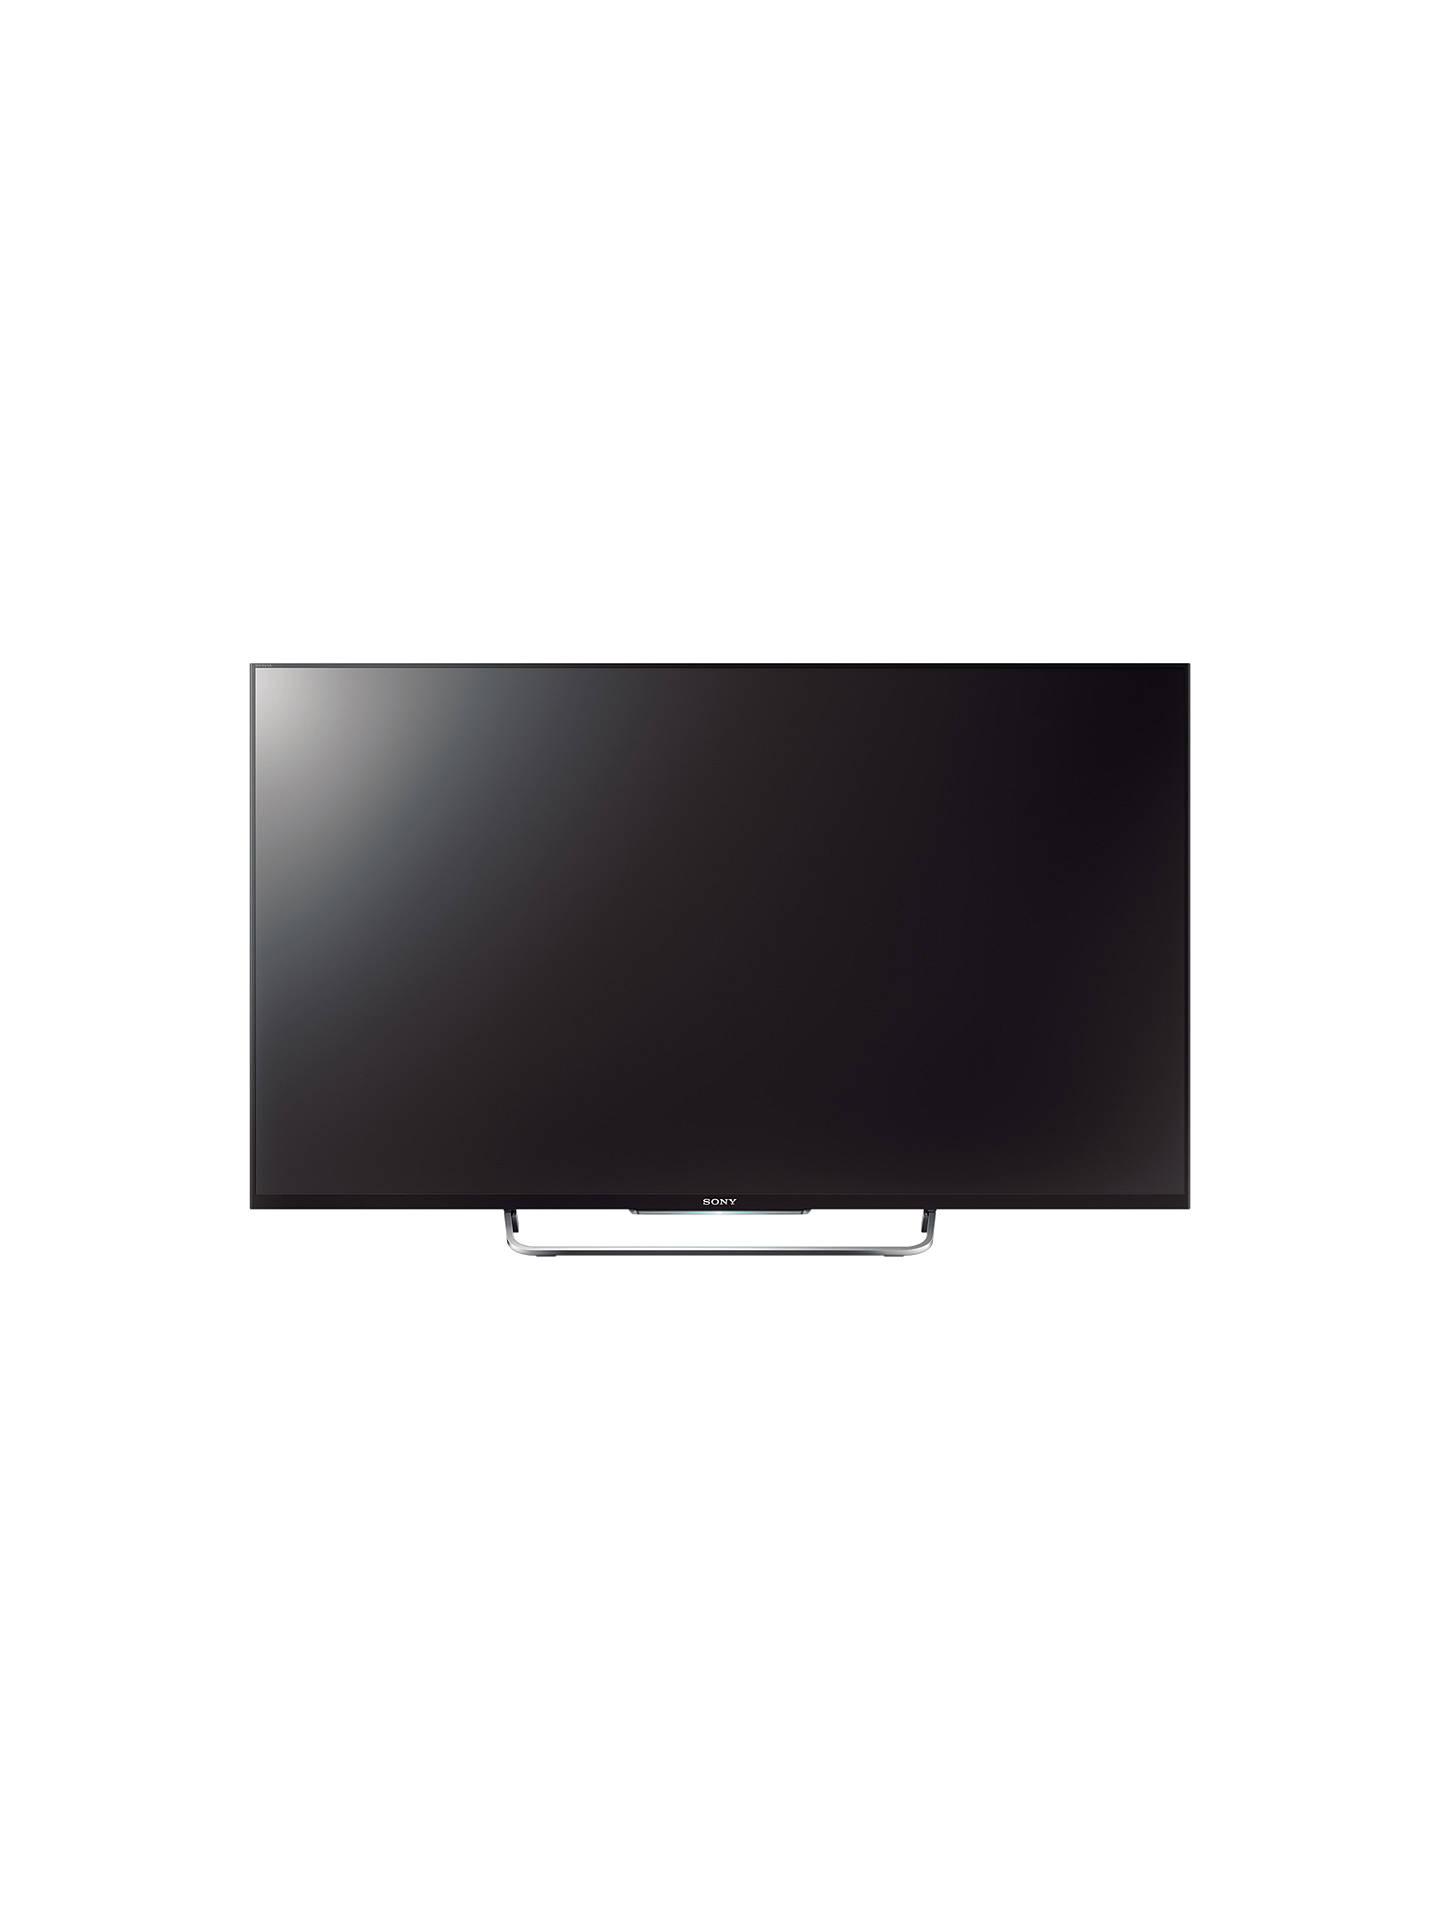 how to get netflix on my sony bravia smart tv